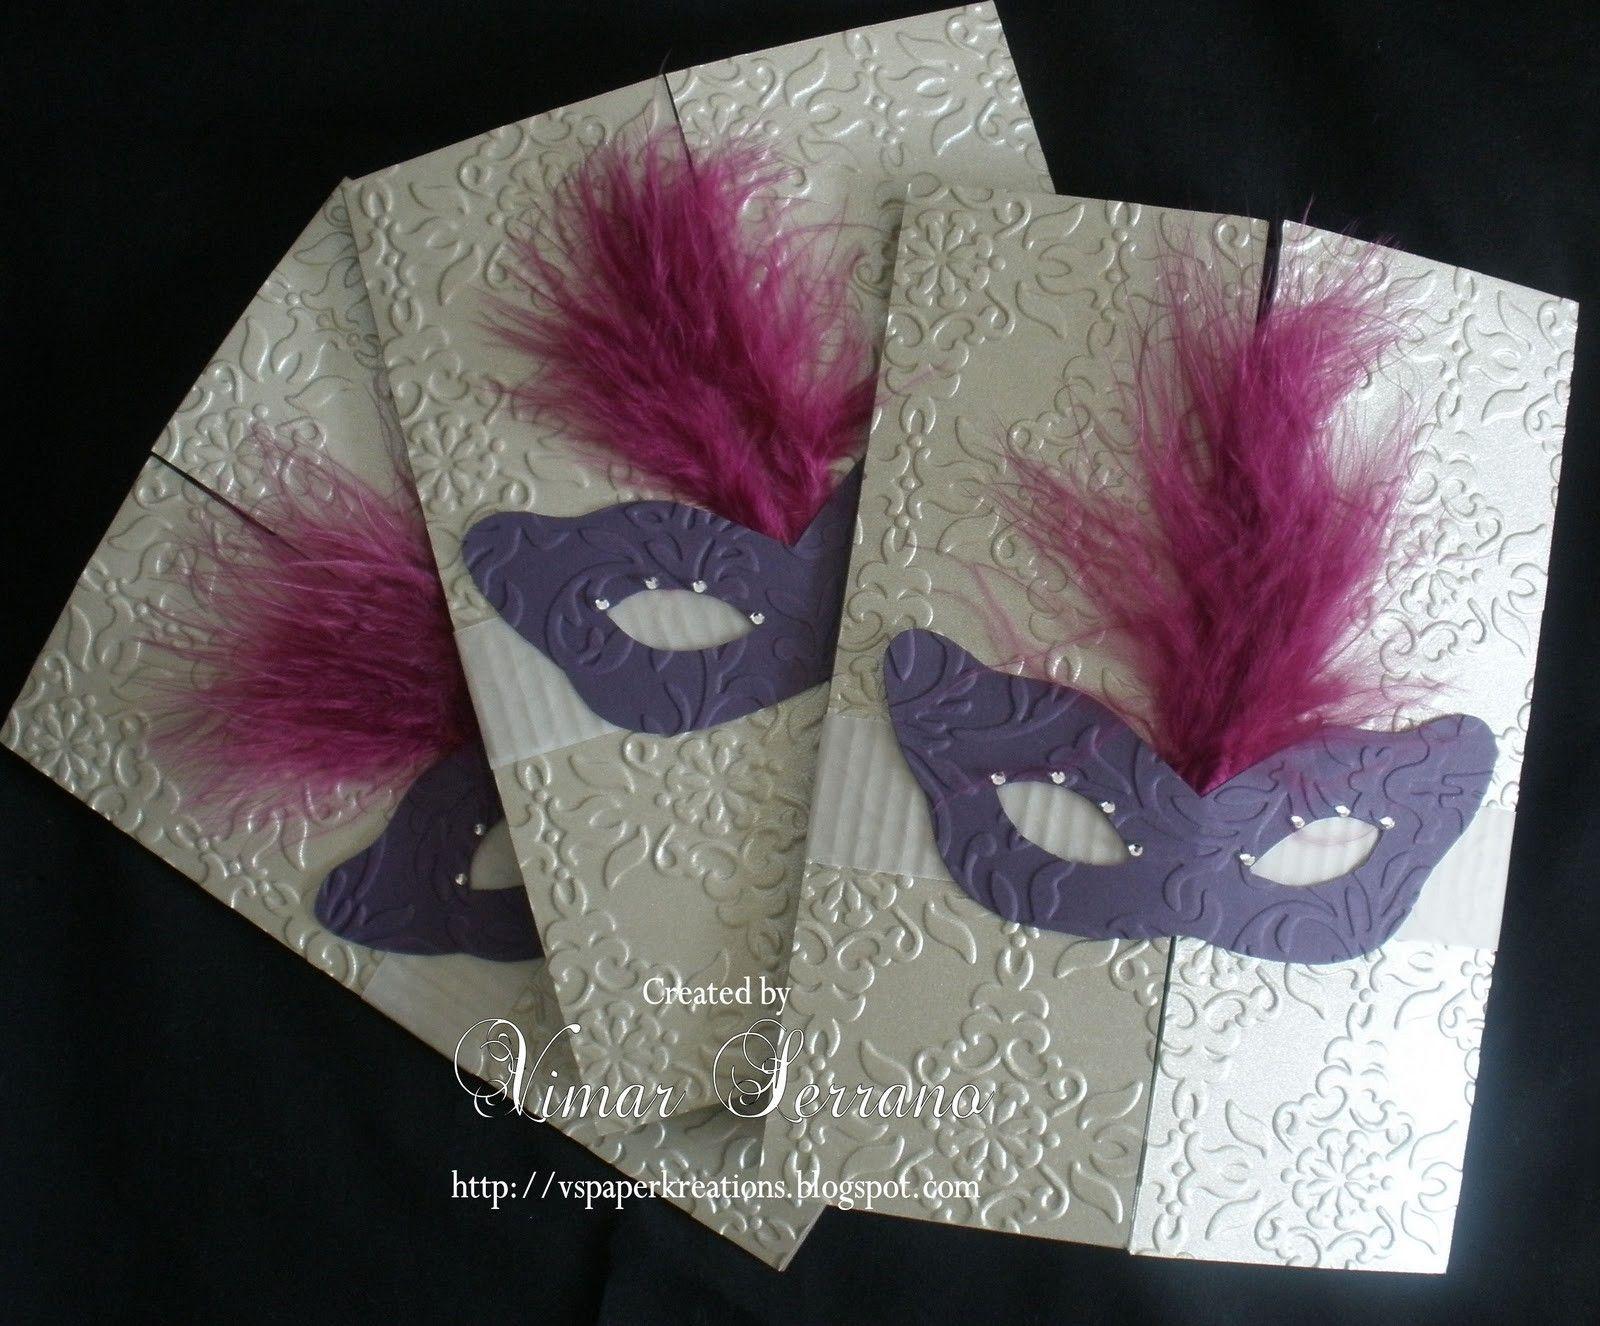 Masquerade Party Invitations – Masquerade Party Invitation Ideas